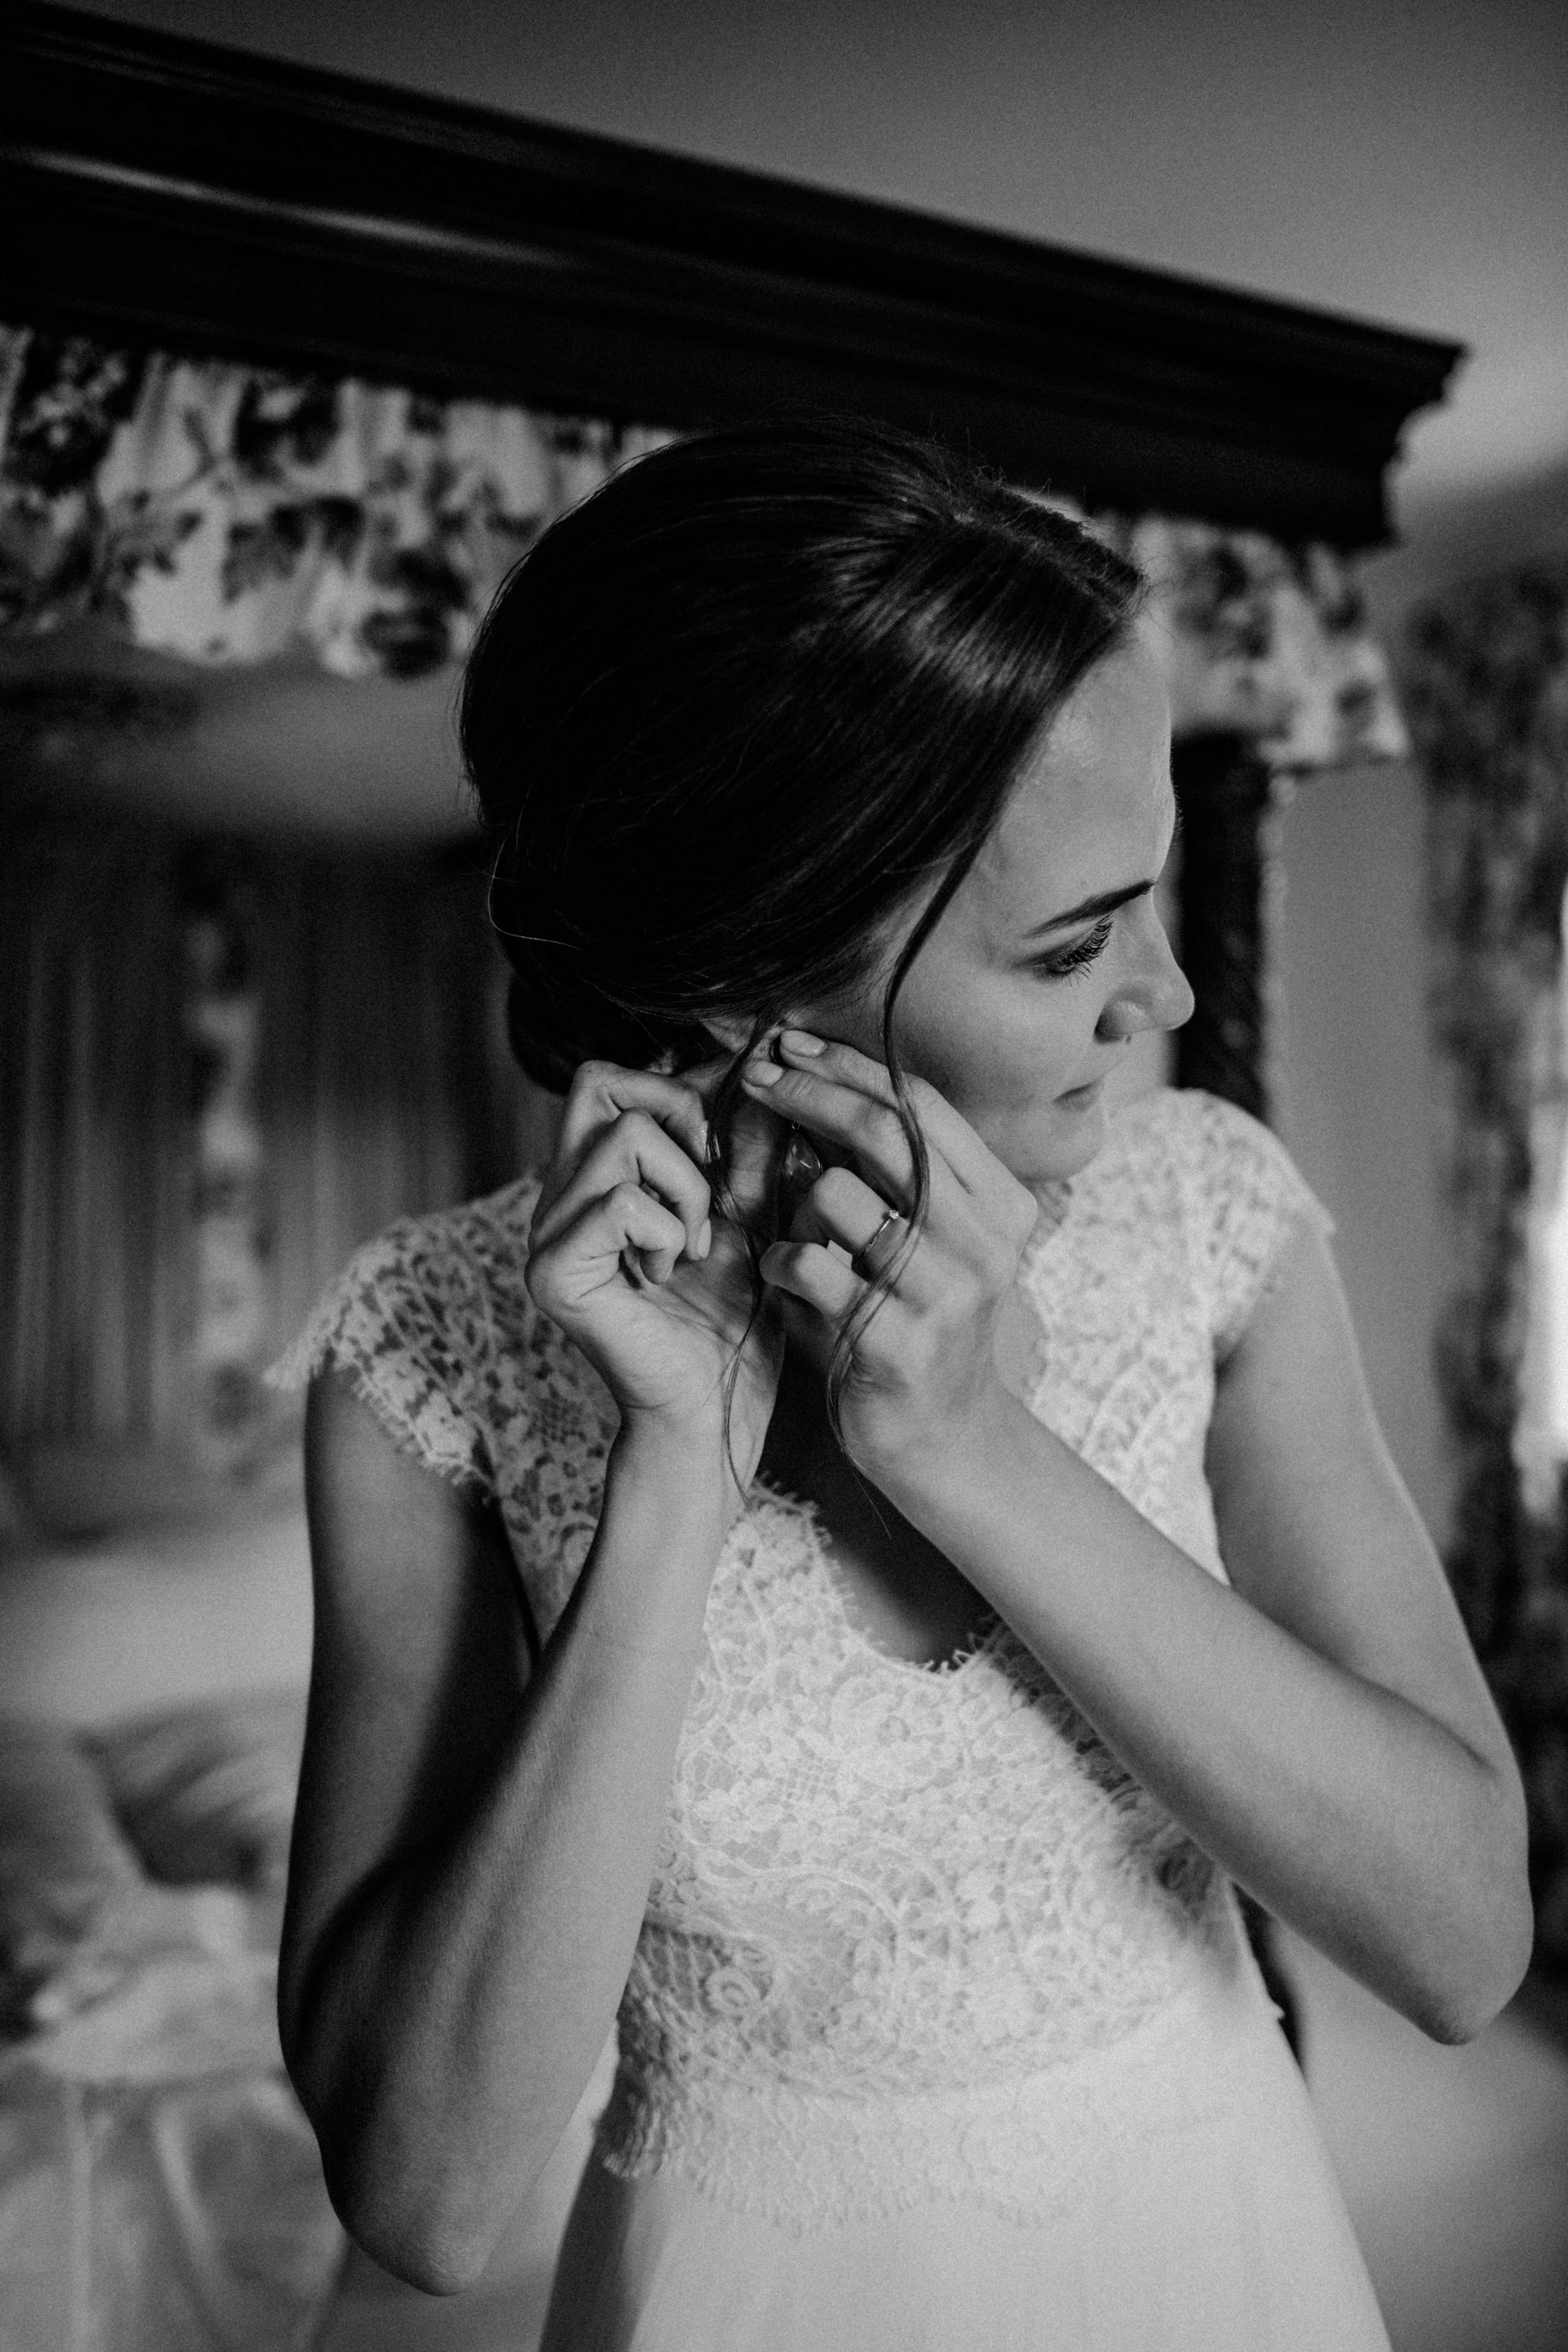 jewellery earrings sonja poehlmann photography couples muenchen bayern